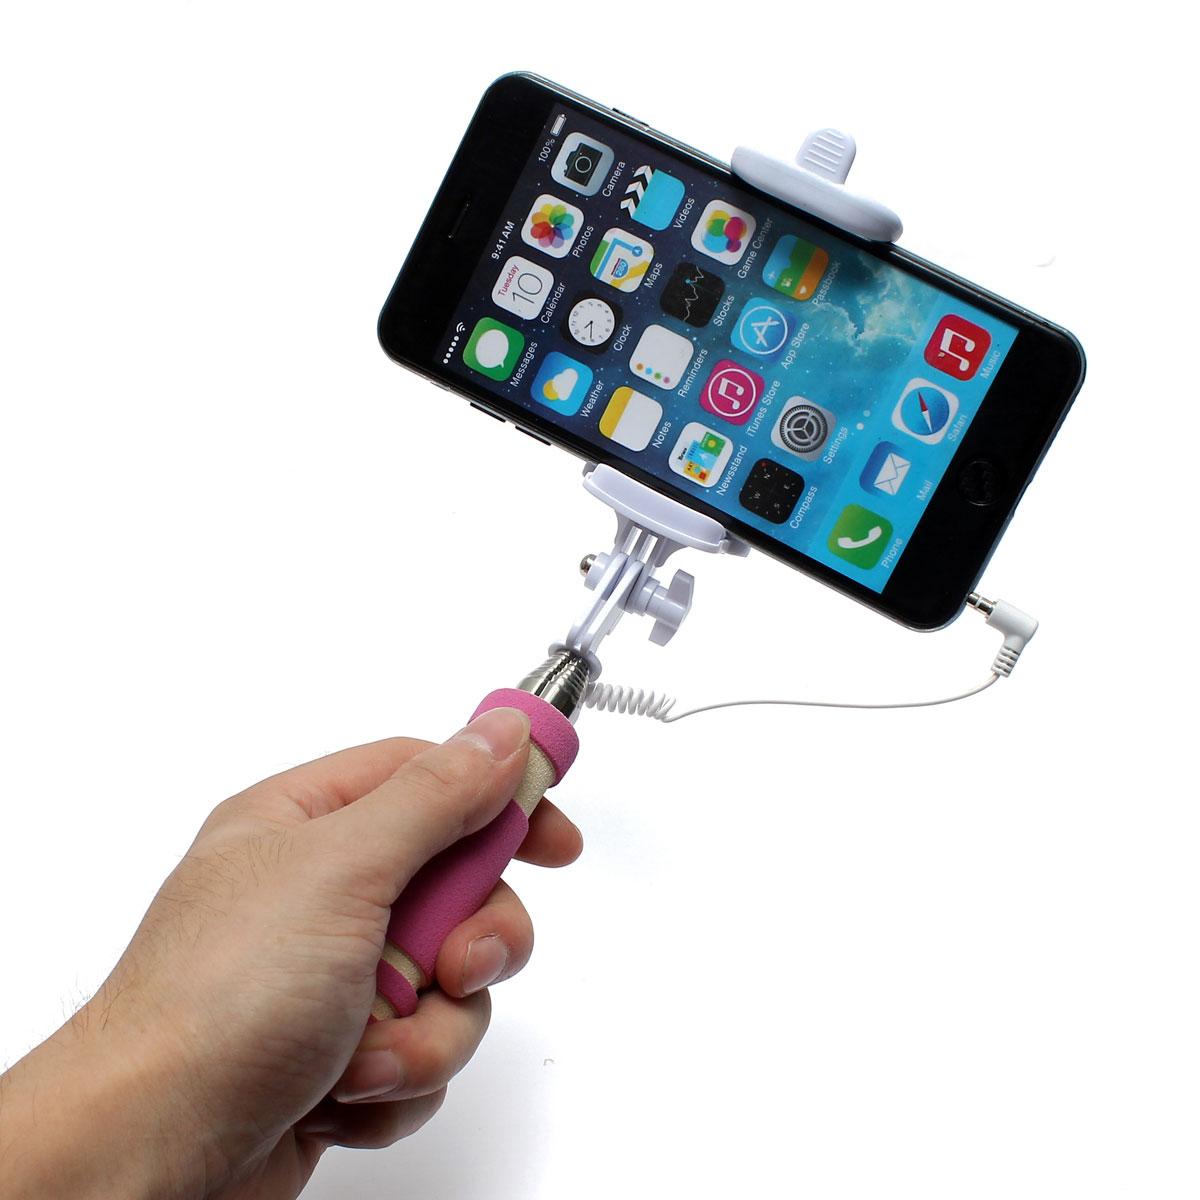 extendable handheld selfie stick wired remote shutter monopod for phone pink lazada ph. Black Bedroom Furniture Sets. Home Design Ideas